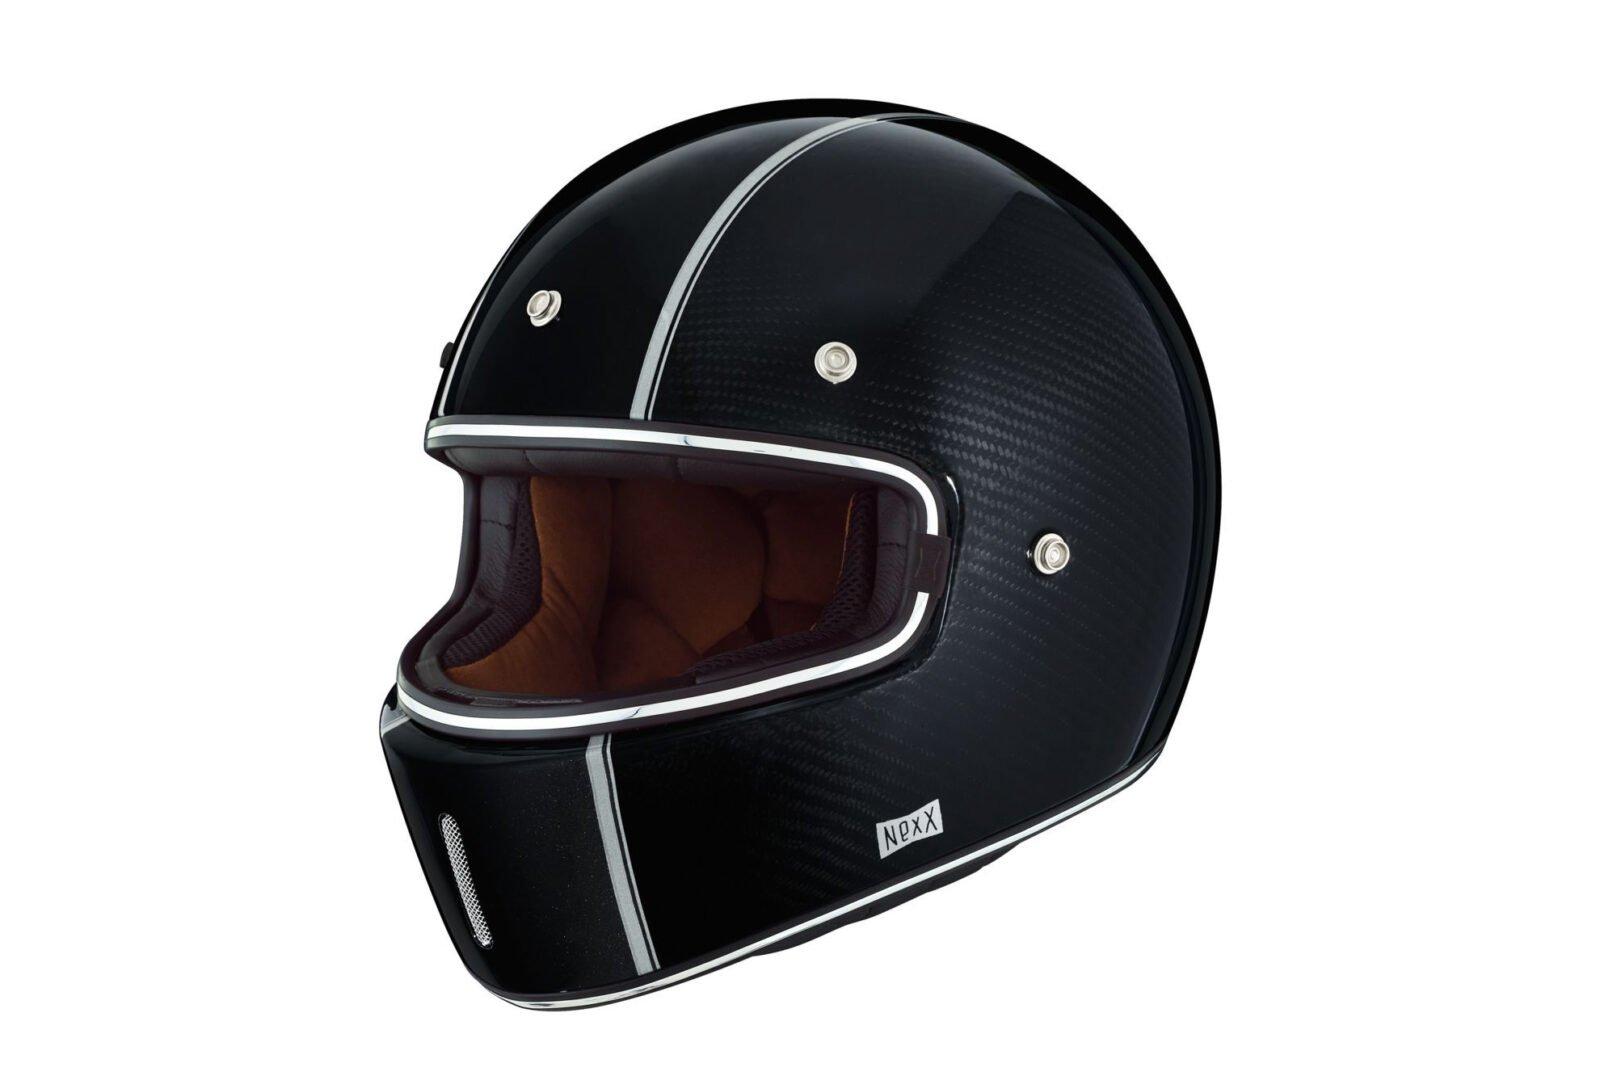 Nexx XG100 Carbon Helmet 1600x1076 - Nexx XG100 Carbon Helmet